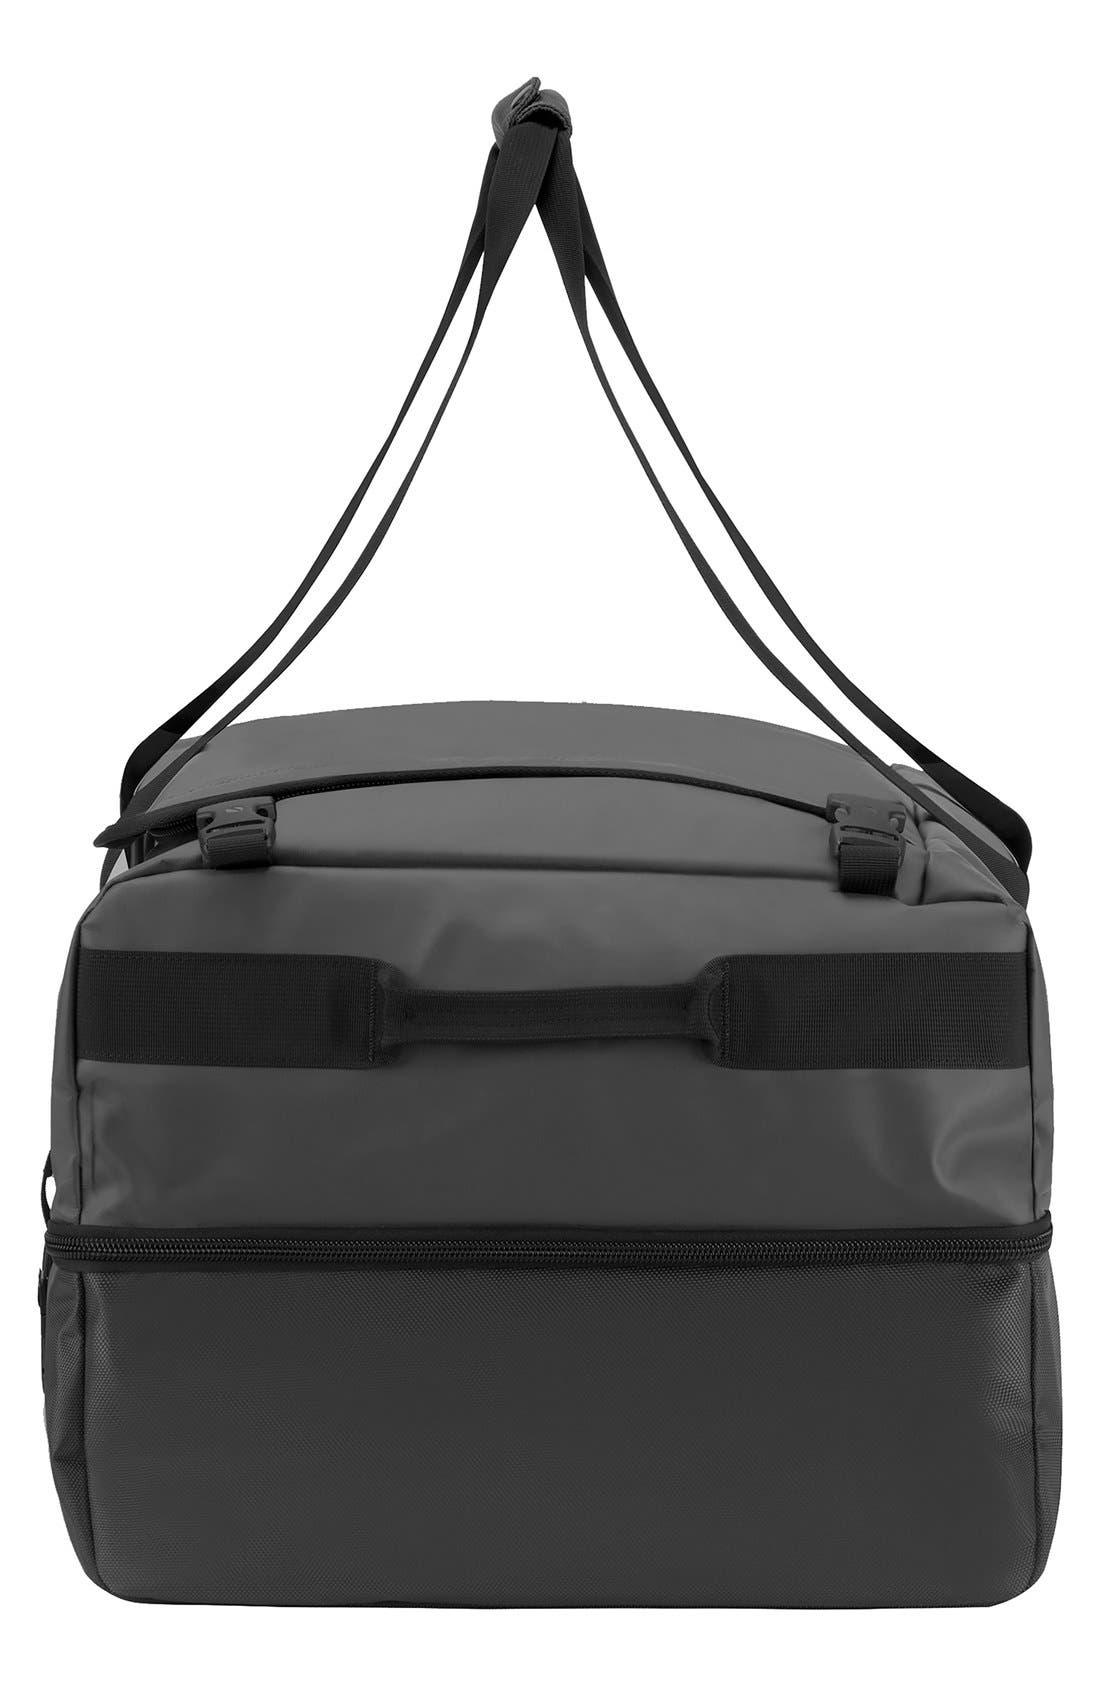 TRACTO Extra Large Split Convertible Duffel Bag,                             Alternate thumbnail 3, color,                             Black